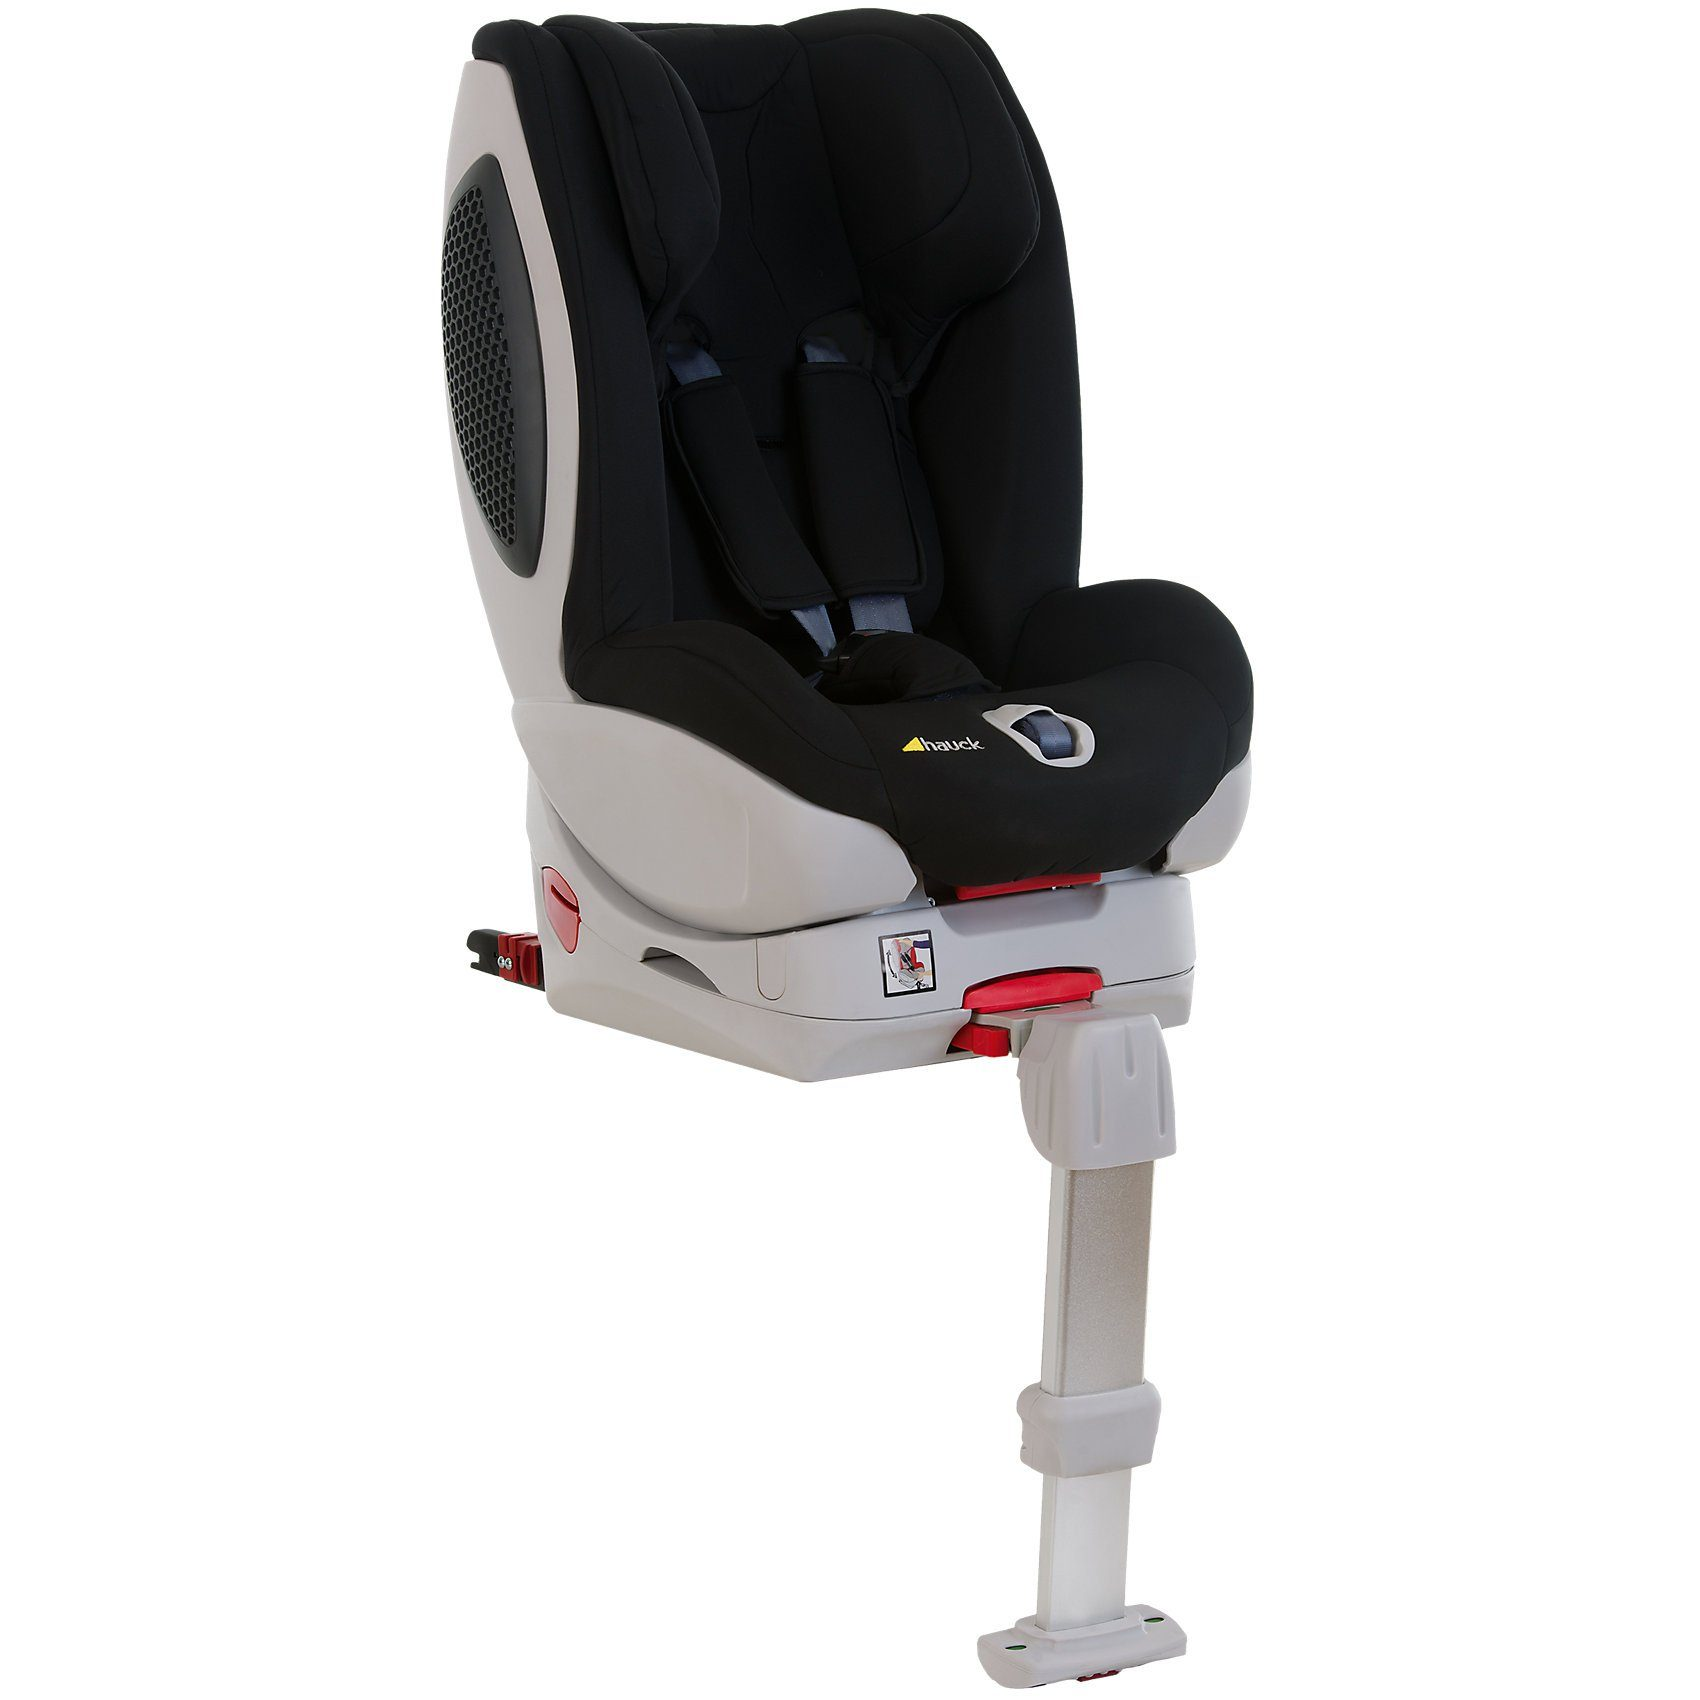 Hauck Auto-Kindersitz Varioguard Plus black/black